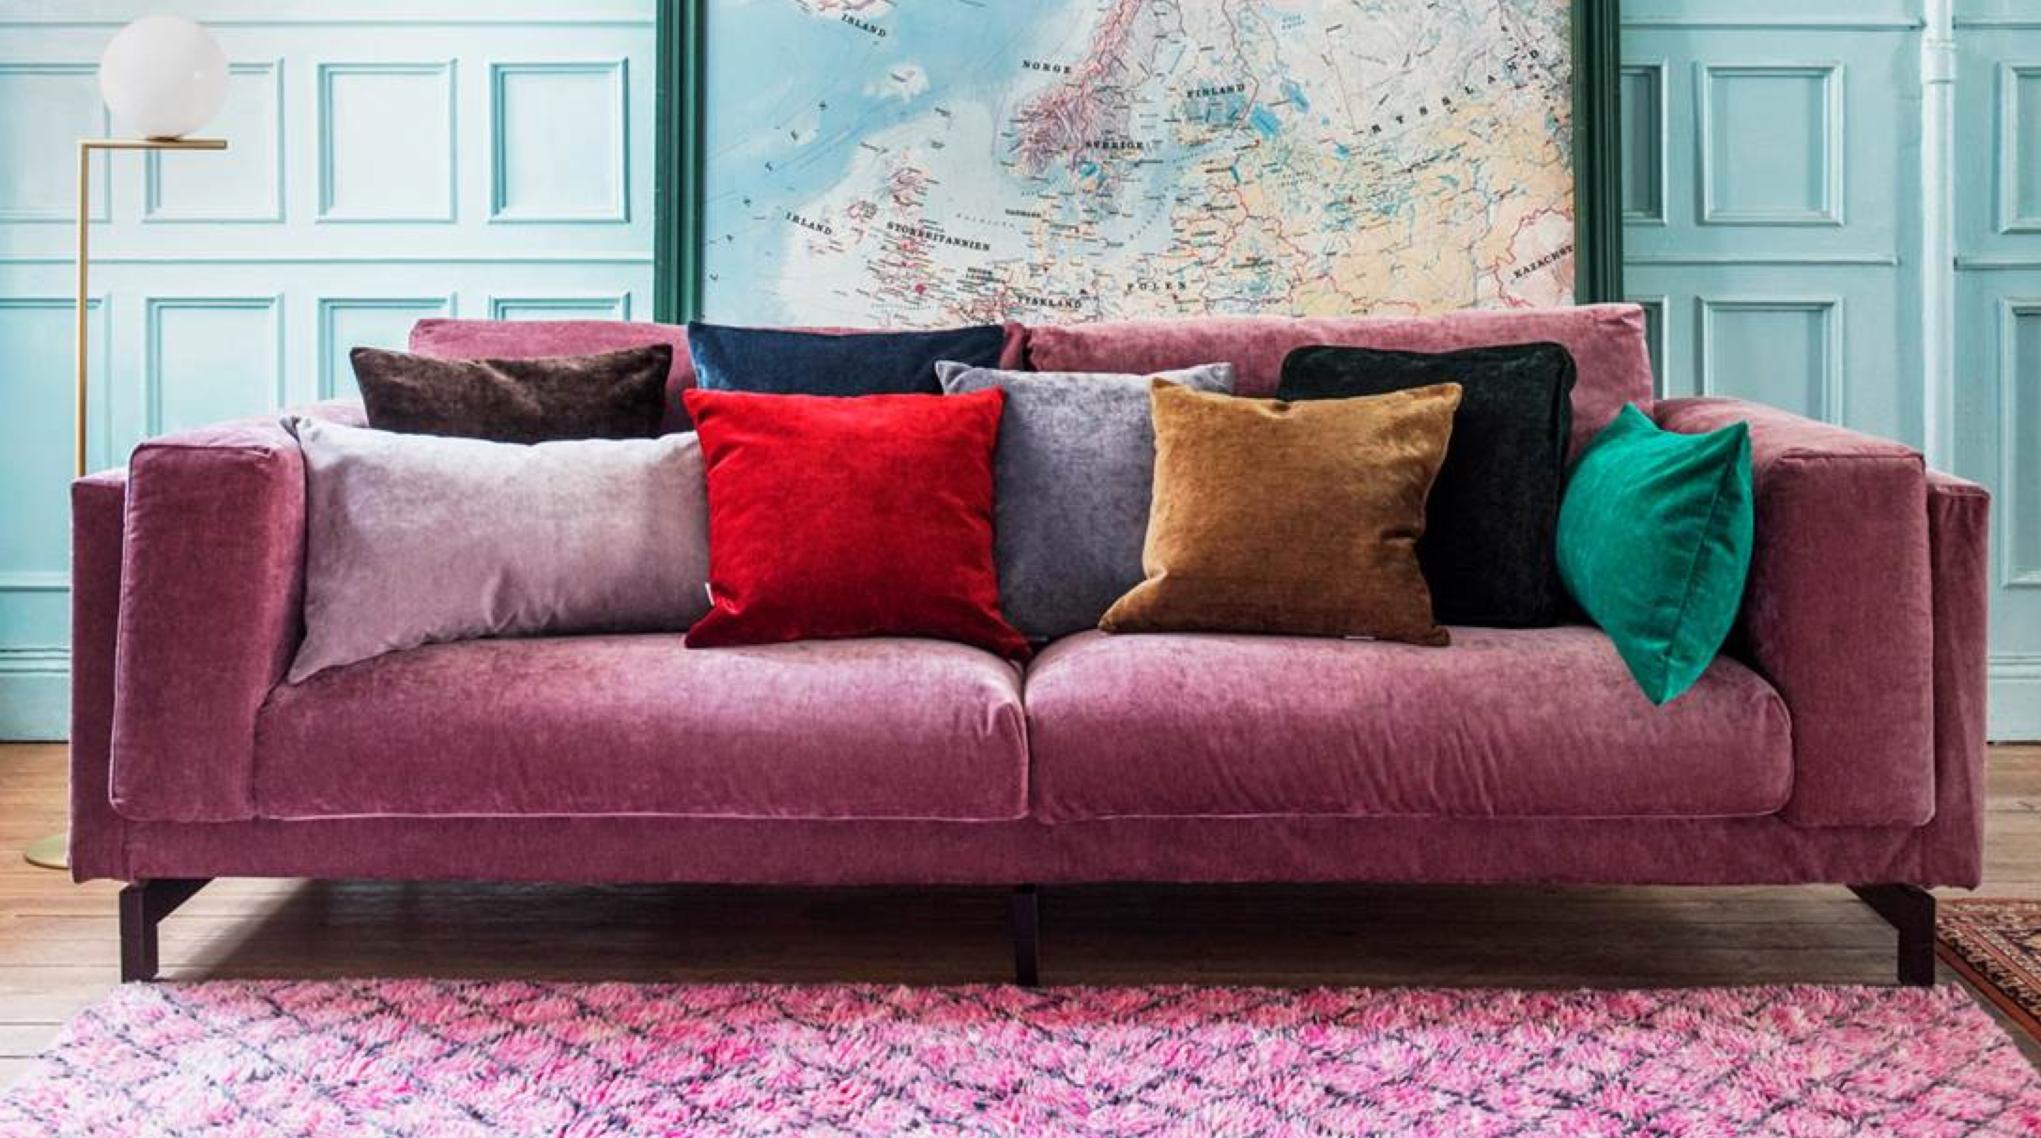 Full Size of Sofa Alternatives For Small Spaces Living Room Cheap Ikea Couch Reddit Best Bed Togo Uk Sleeper To Sofas Crossword Sitzsack Spannbezug 3er Microfaser Großes Sofa Sofa Alternatives